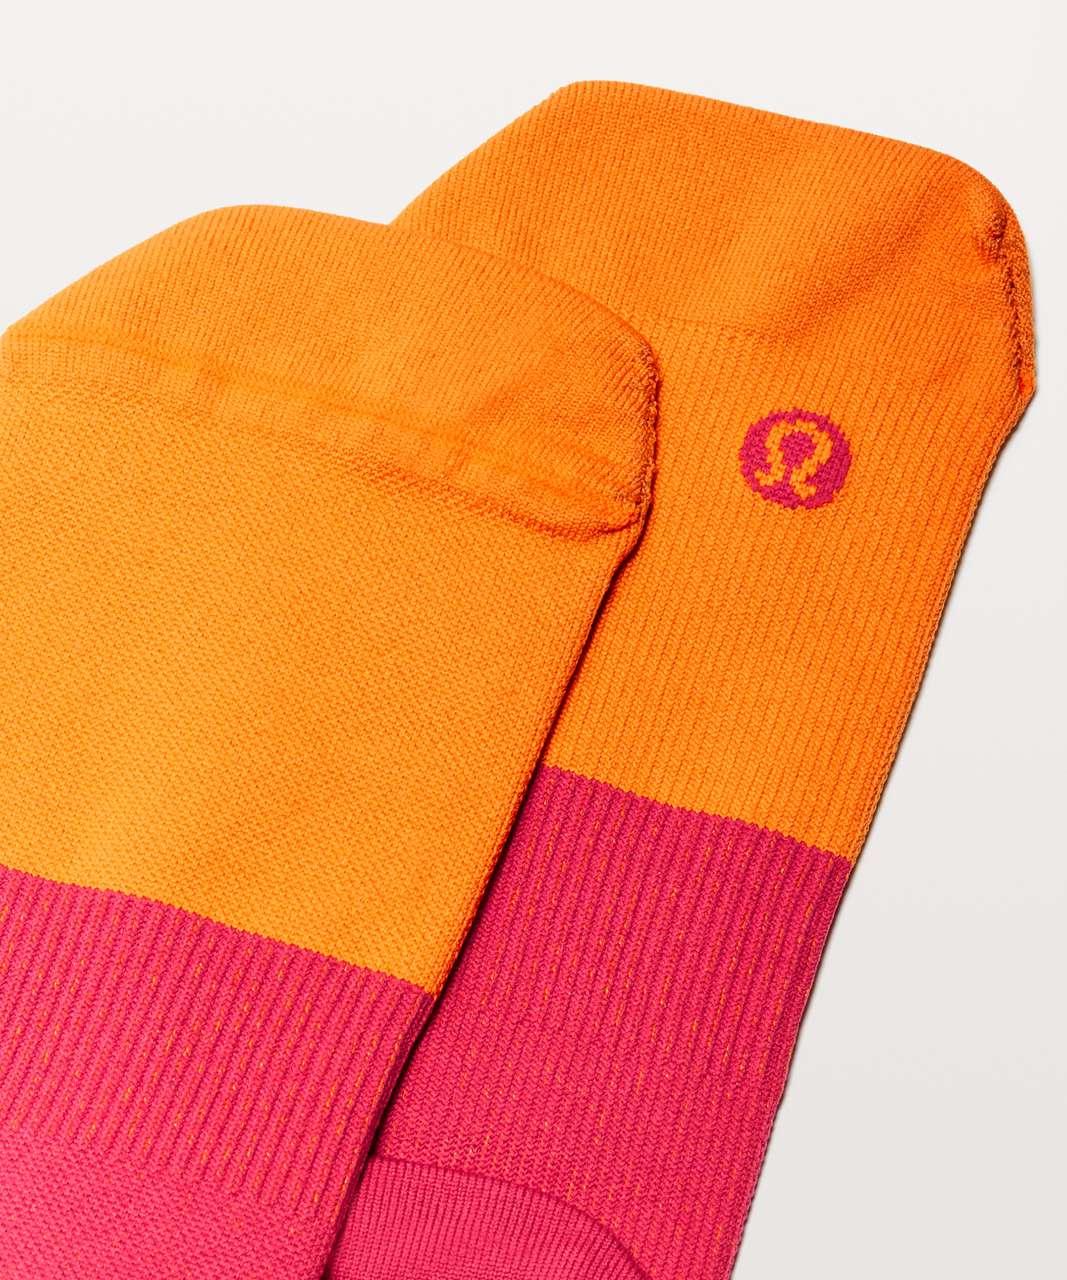 Lululemon Light Speed Sock *Silver - Vivid Amber / Fuchsia Pink